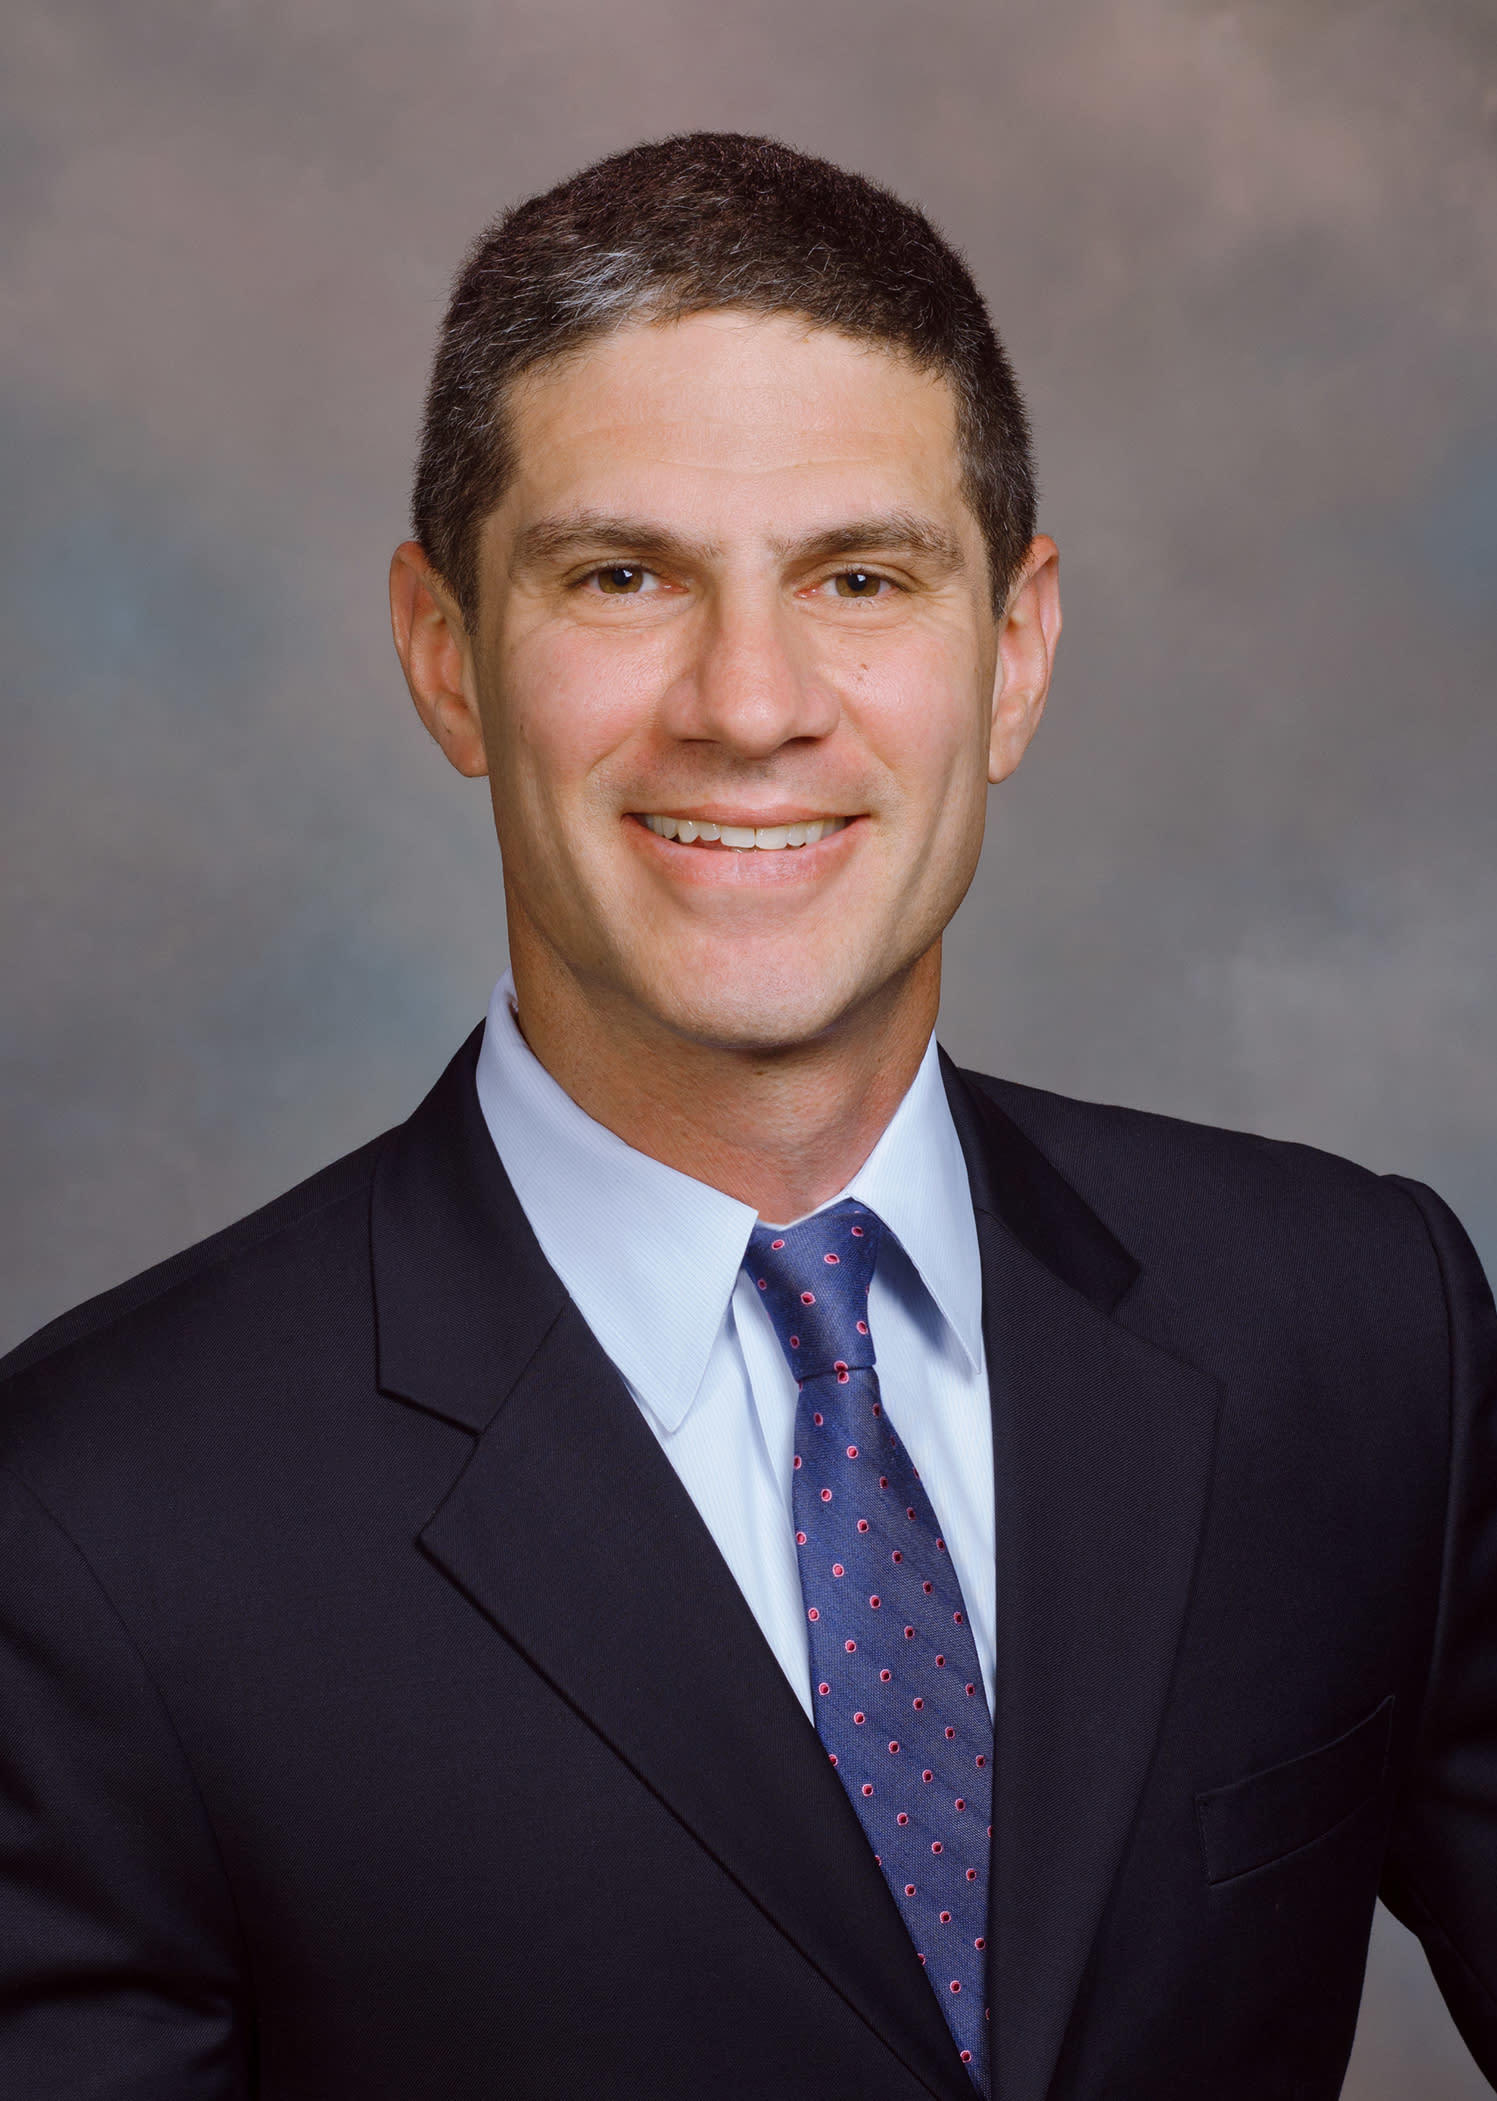 Austin Brockenbrough & Associates, LLC is proud to announce that Bob Polino has been made a Partner